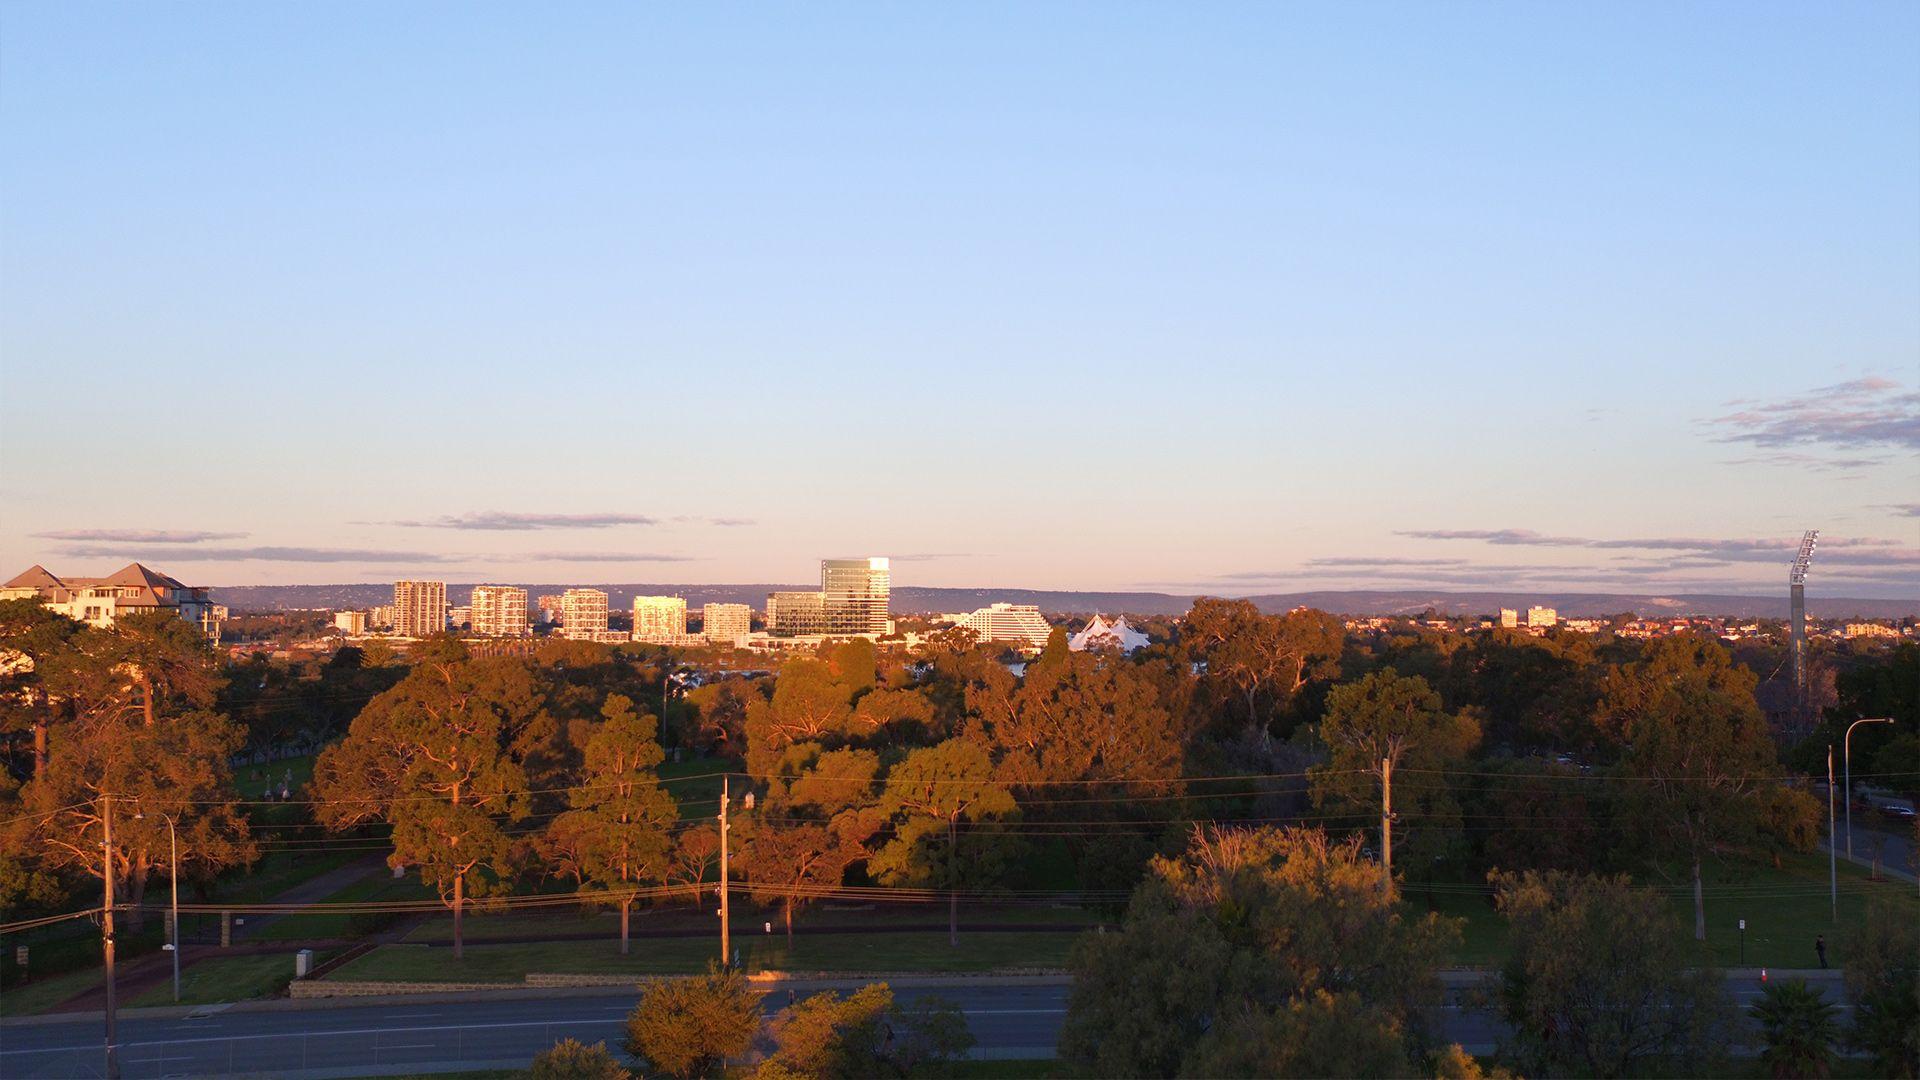 32/17 Wickham St, East Perth WA 6004, Image 12